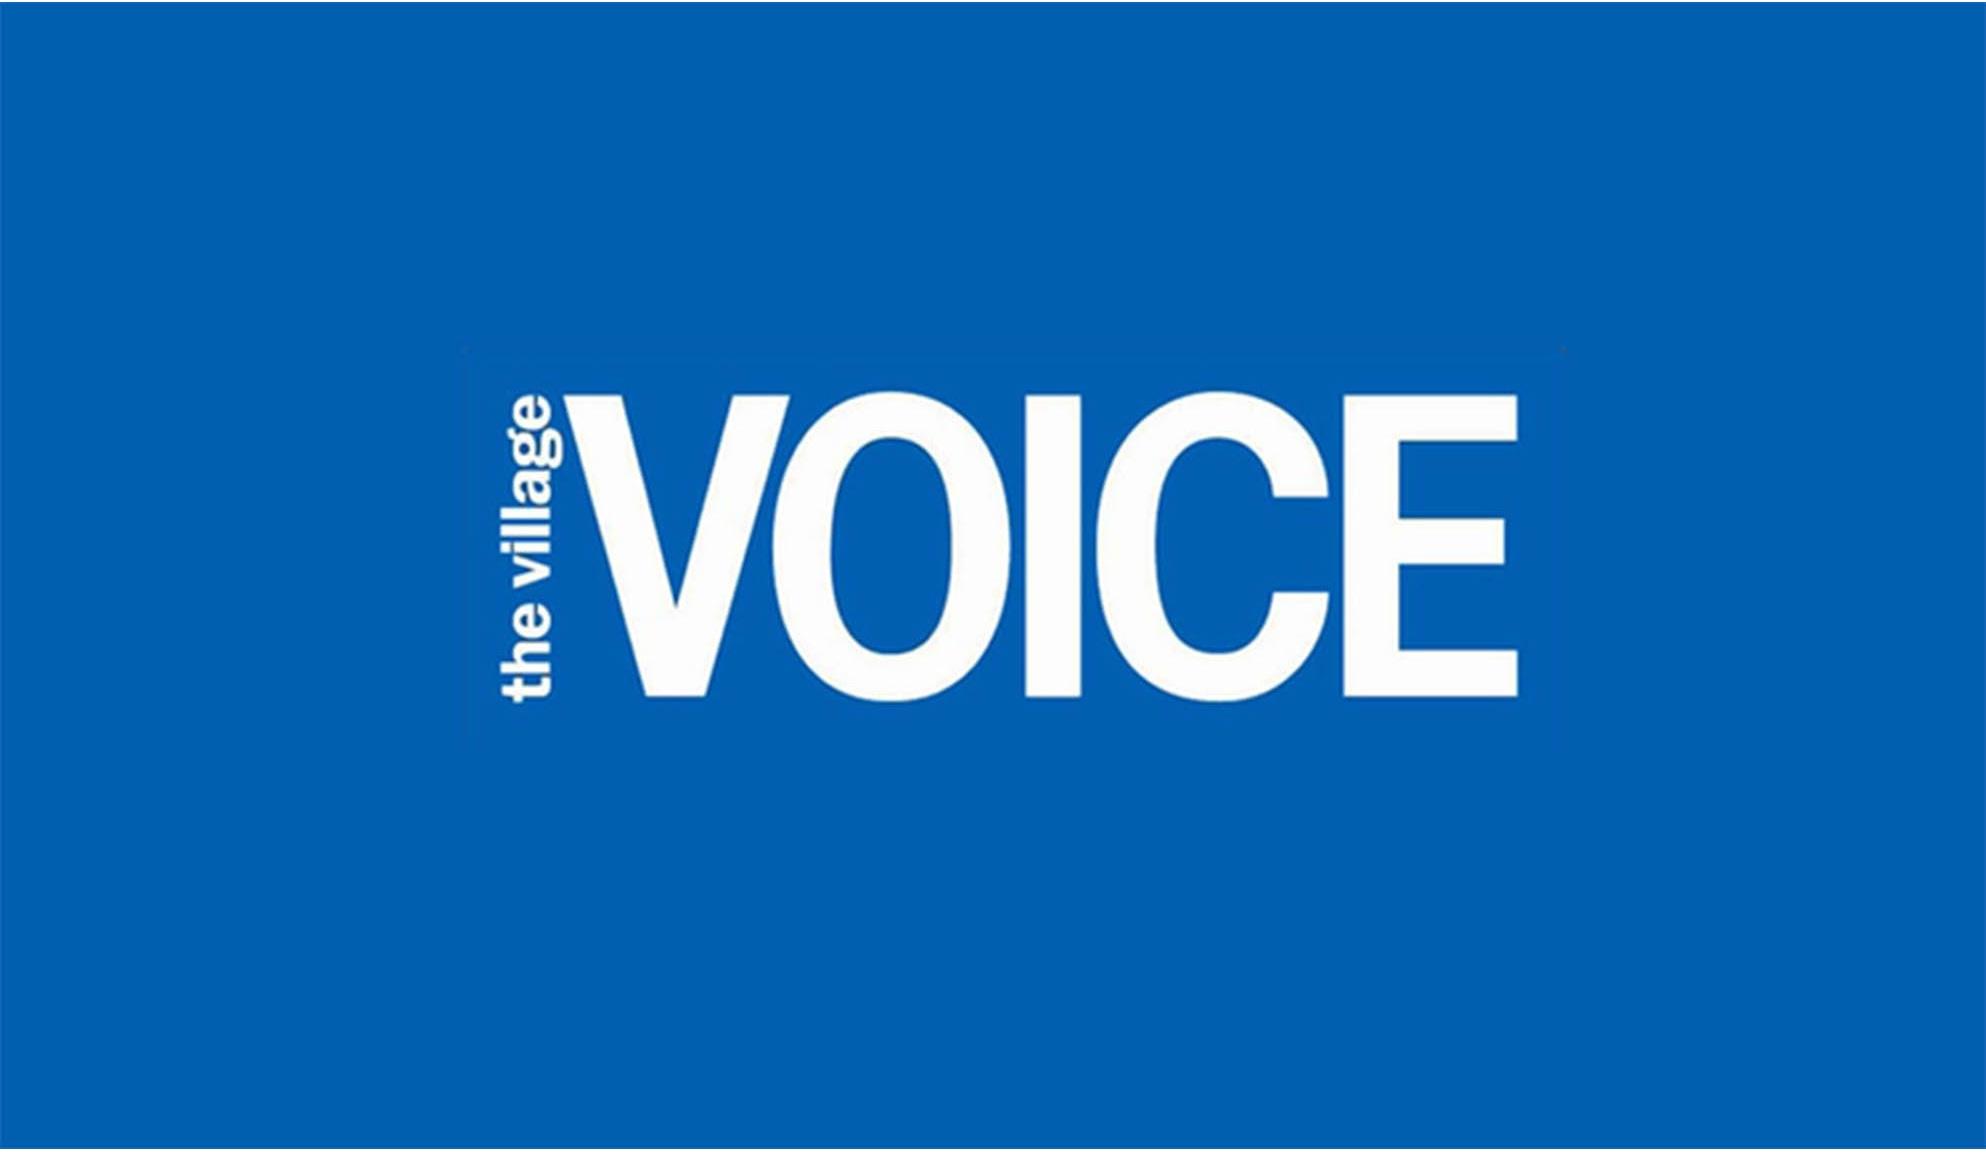 village-voice-moaph.jpg